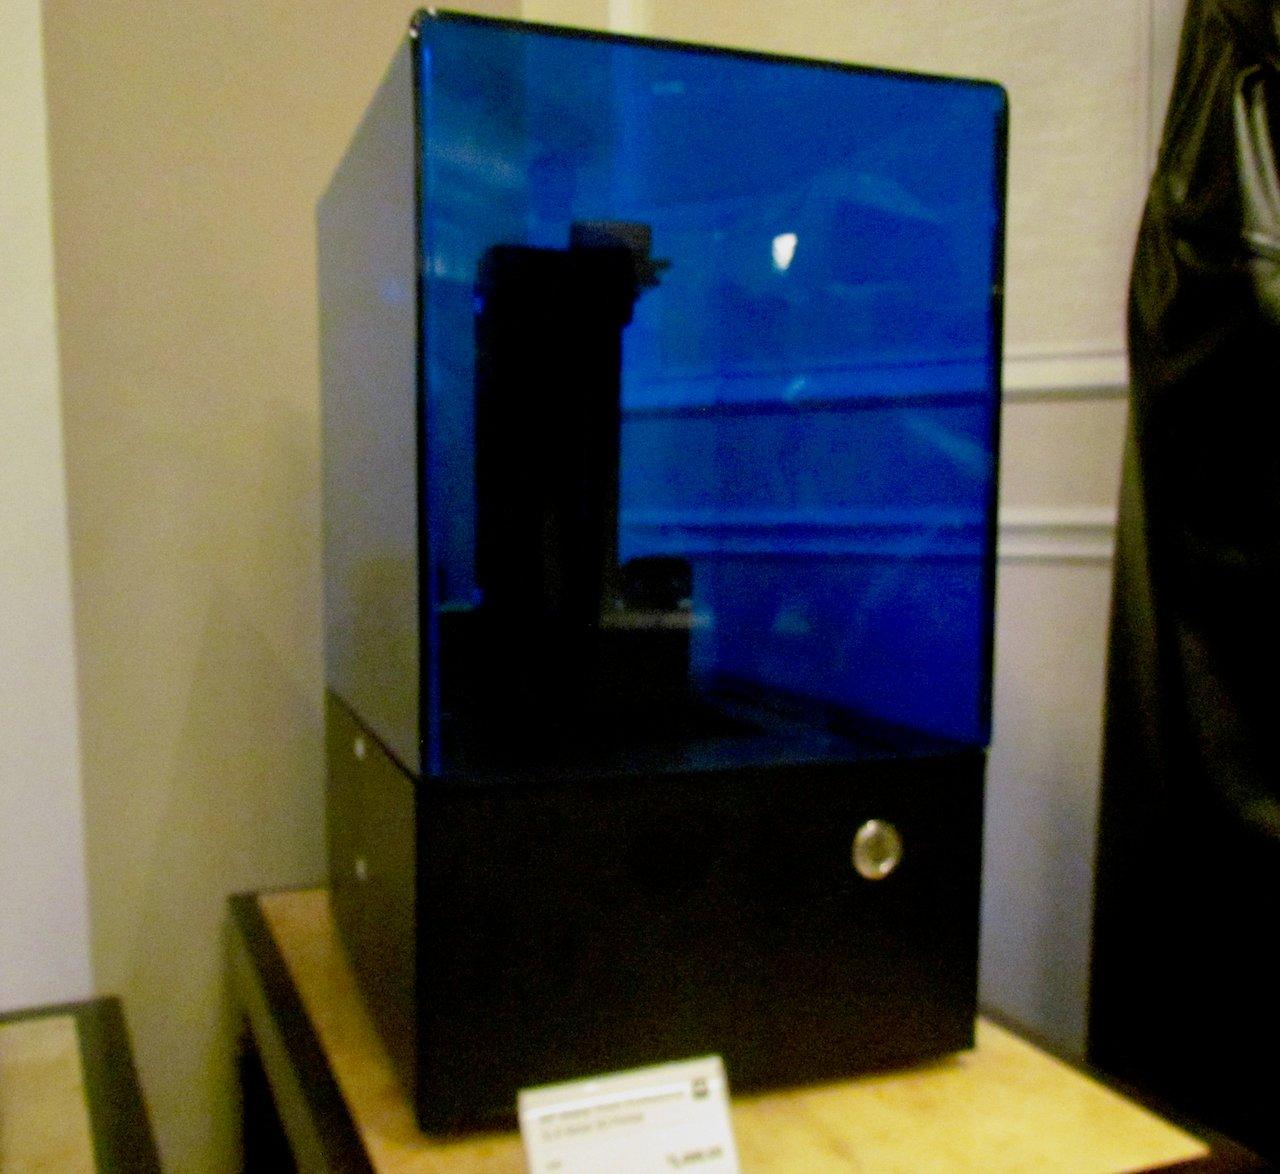 The new Monoprice Prism Professional resin-based desktop 3D printer